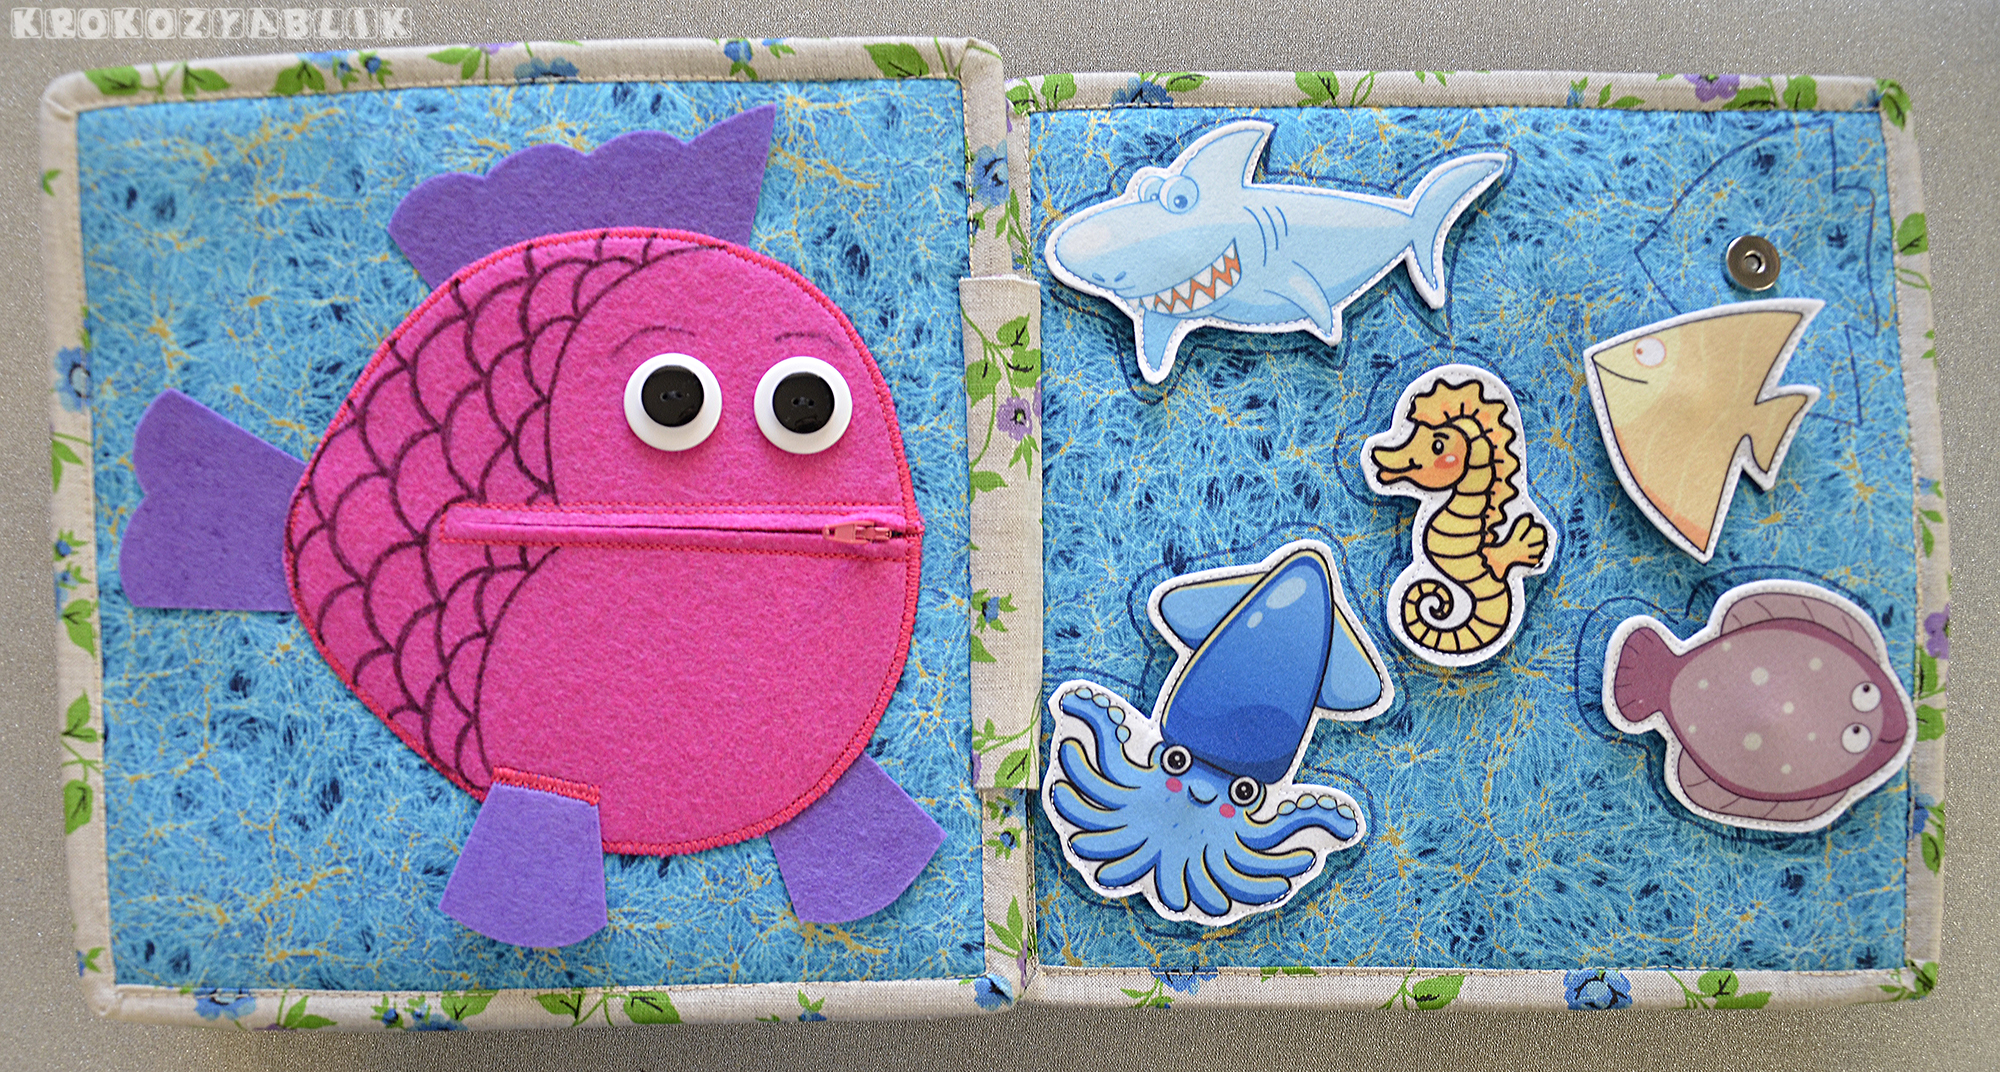 книжка для малышки рыба застежка молния рыбки.JPG